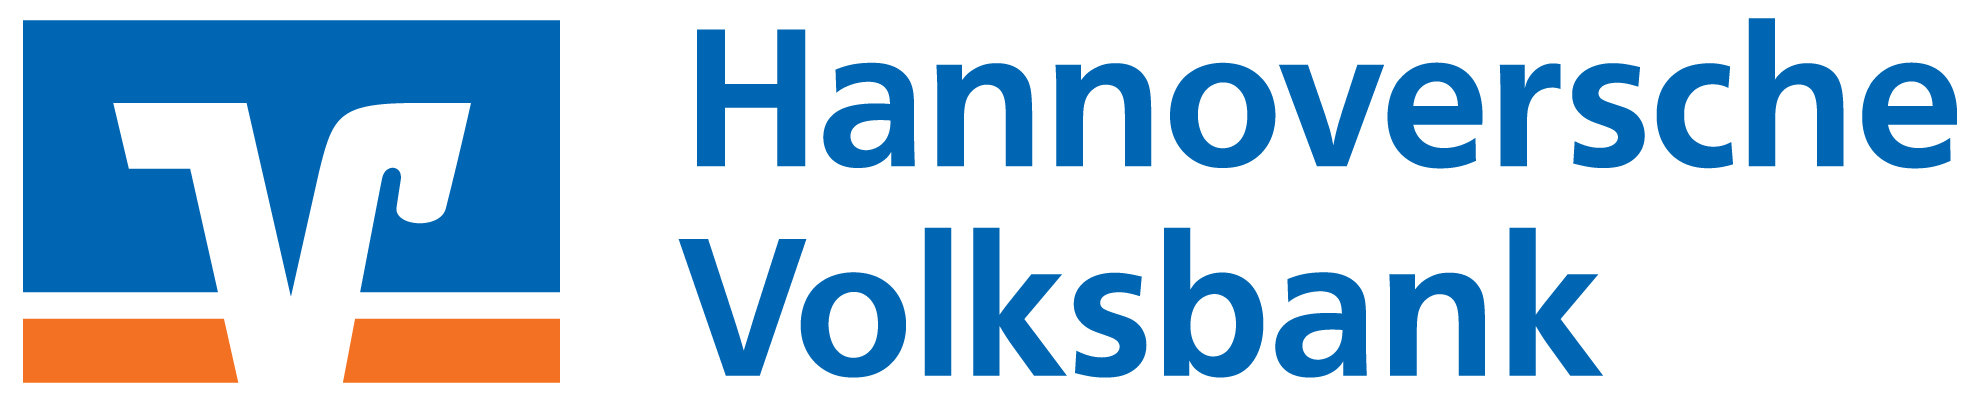 Hannoversche Volksbank eG Geldautomat Hannover (Kröpke / U-Bahn-Station)